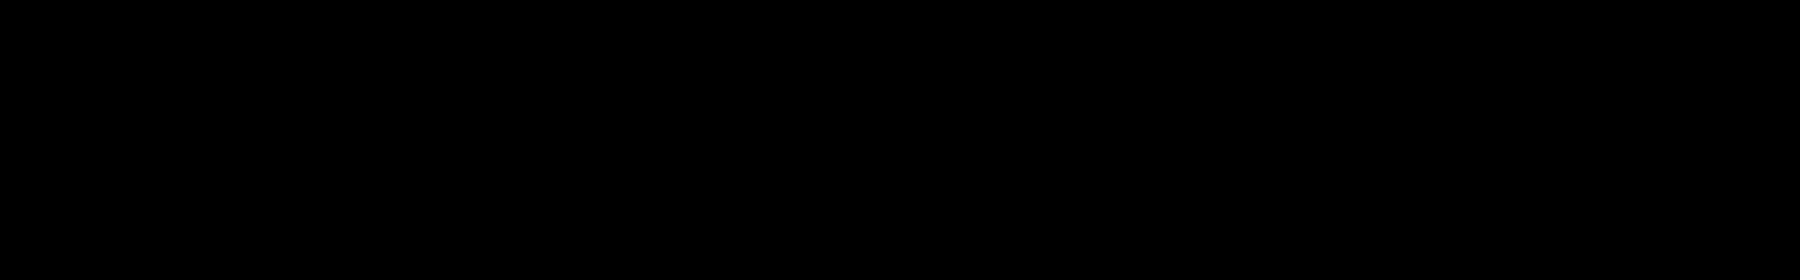 NIGHTWAVE VOL 2 audio waveform